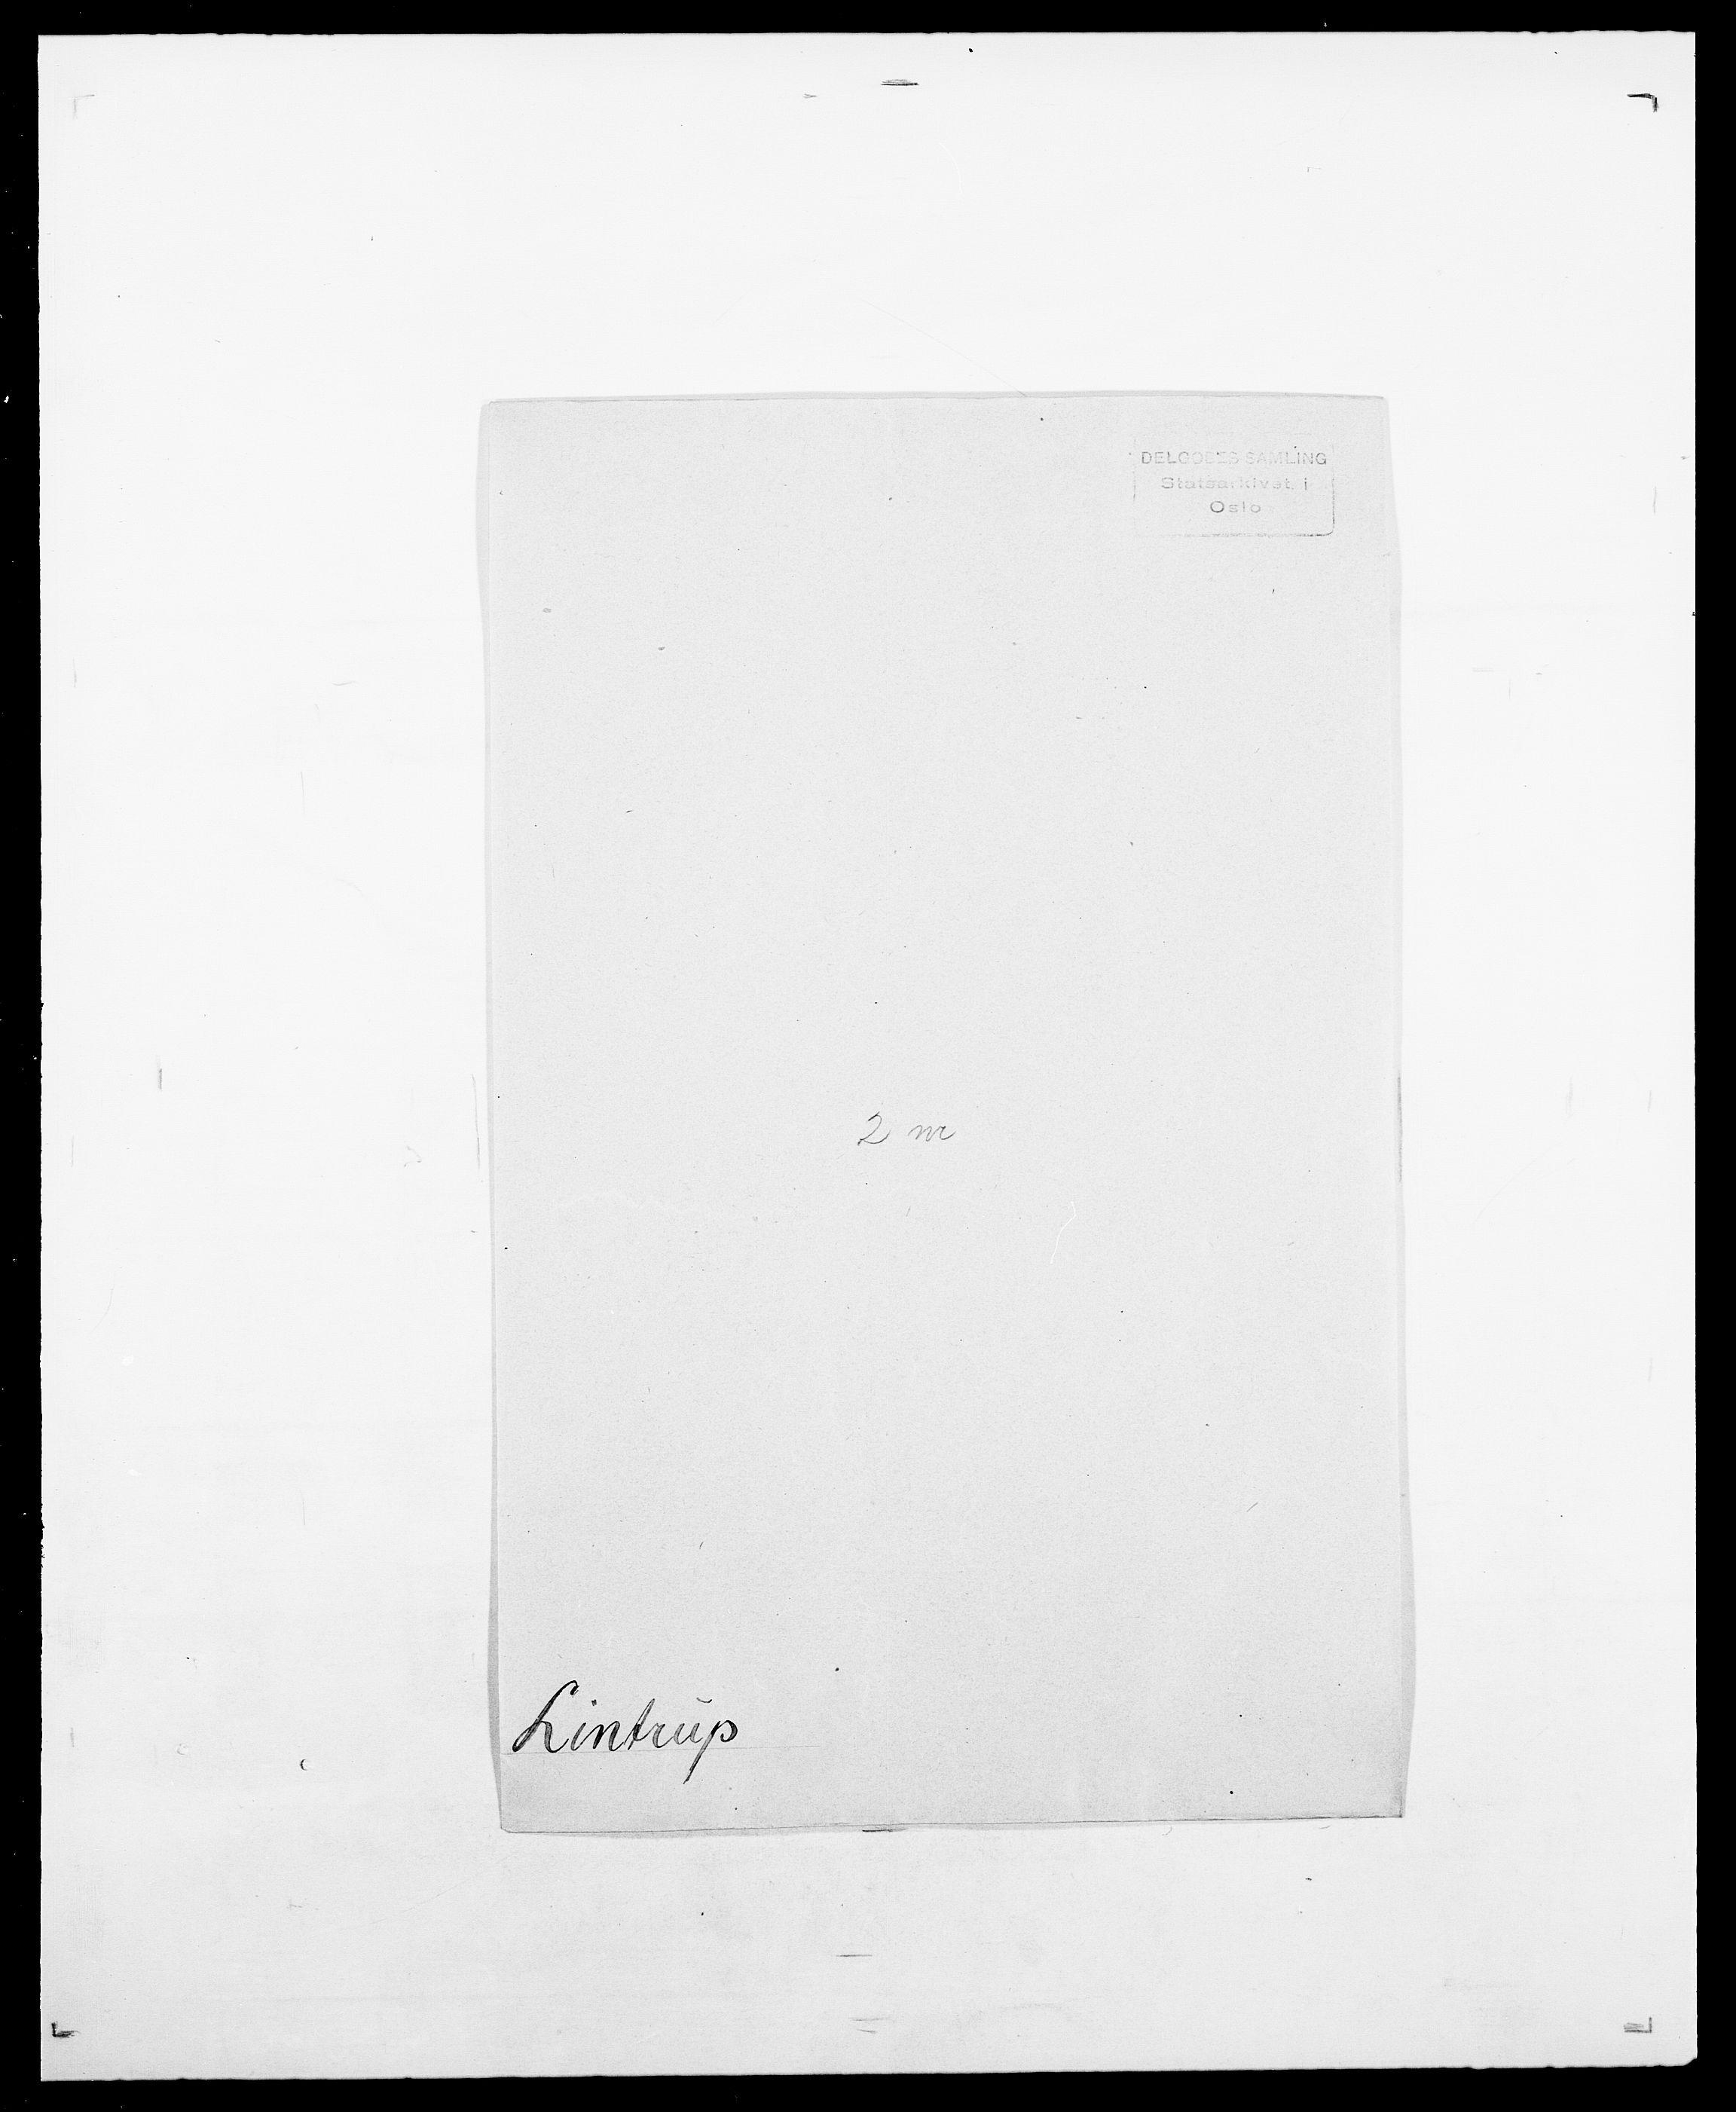 SAO, Delgobe, Charles Antoine - samling, D/Da/L0023: Lau - Lirvyn, s. 679